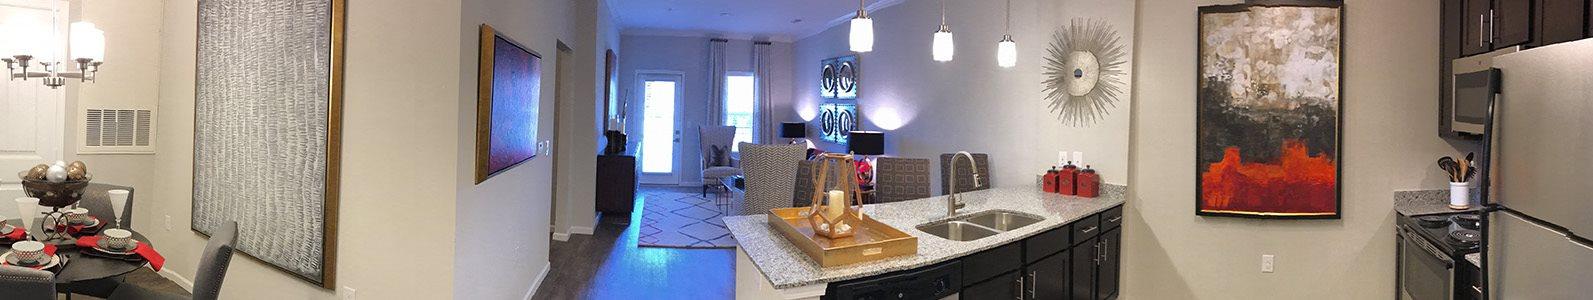 Upgraded Modern Lighting at Greymont Village Apartments, Asheville, 28806